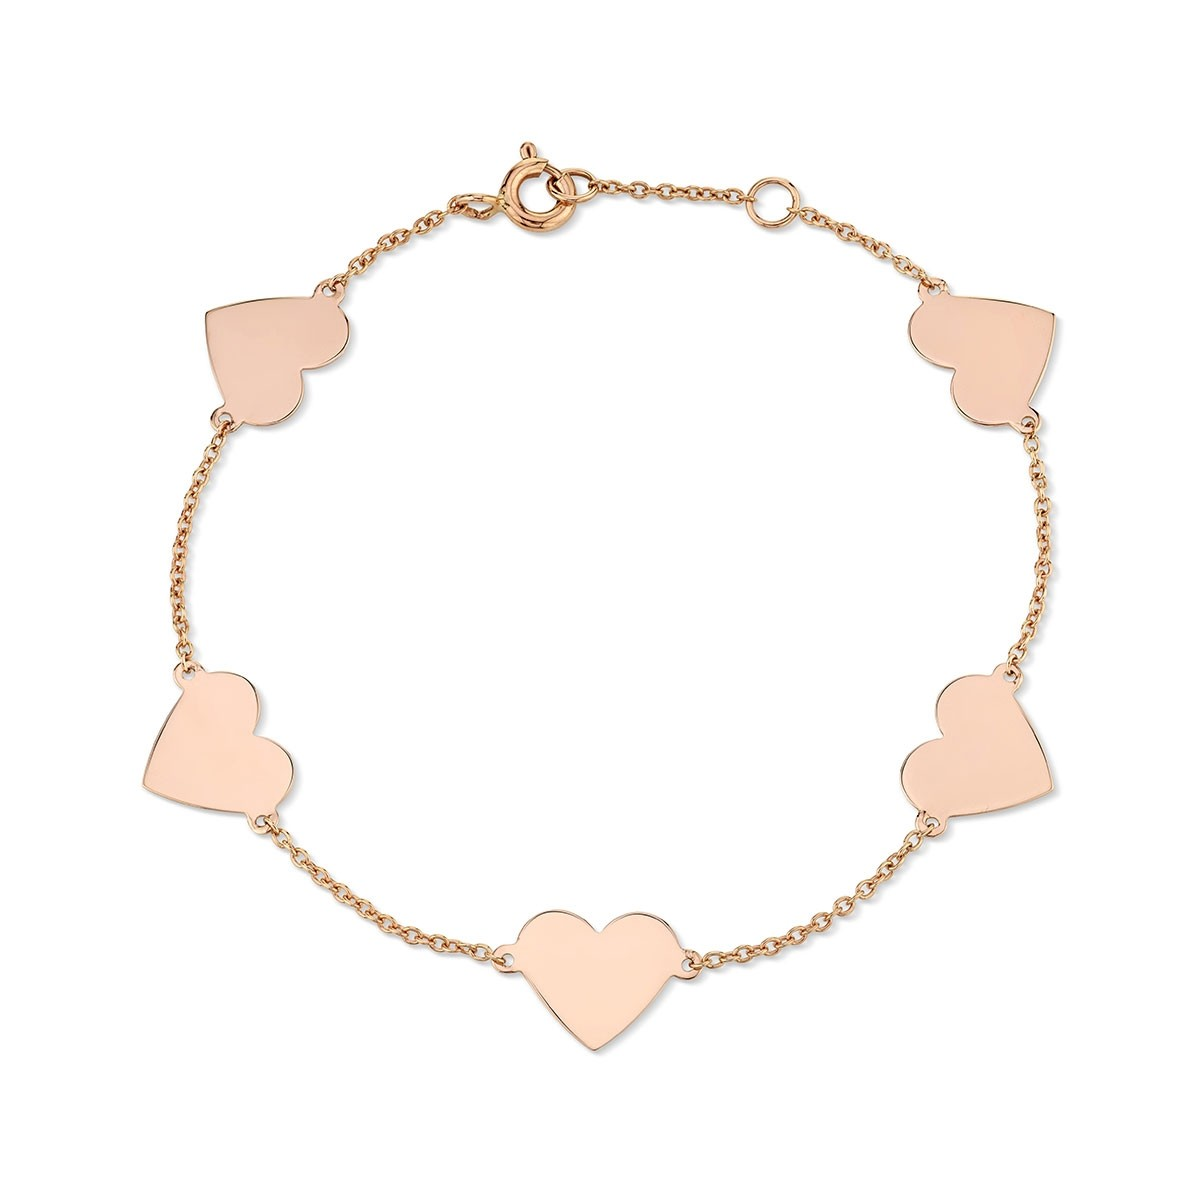 14k Rose Gold 5 Floating Heart Bracelet